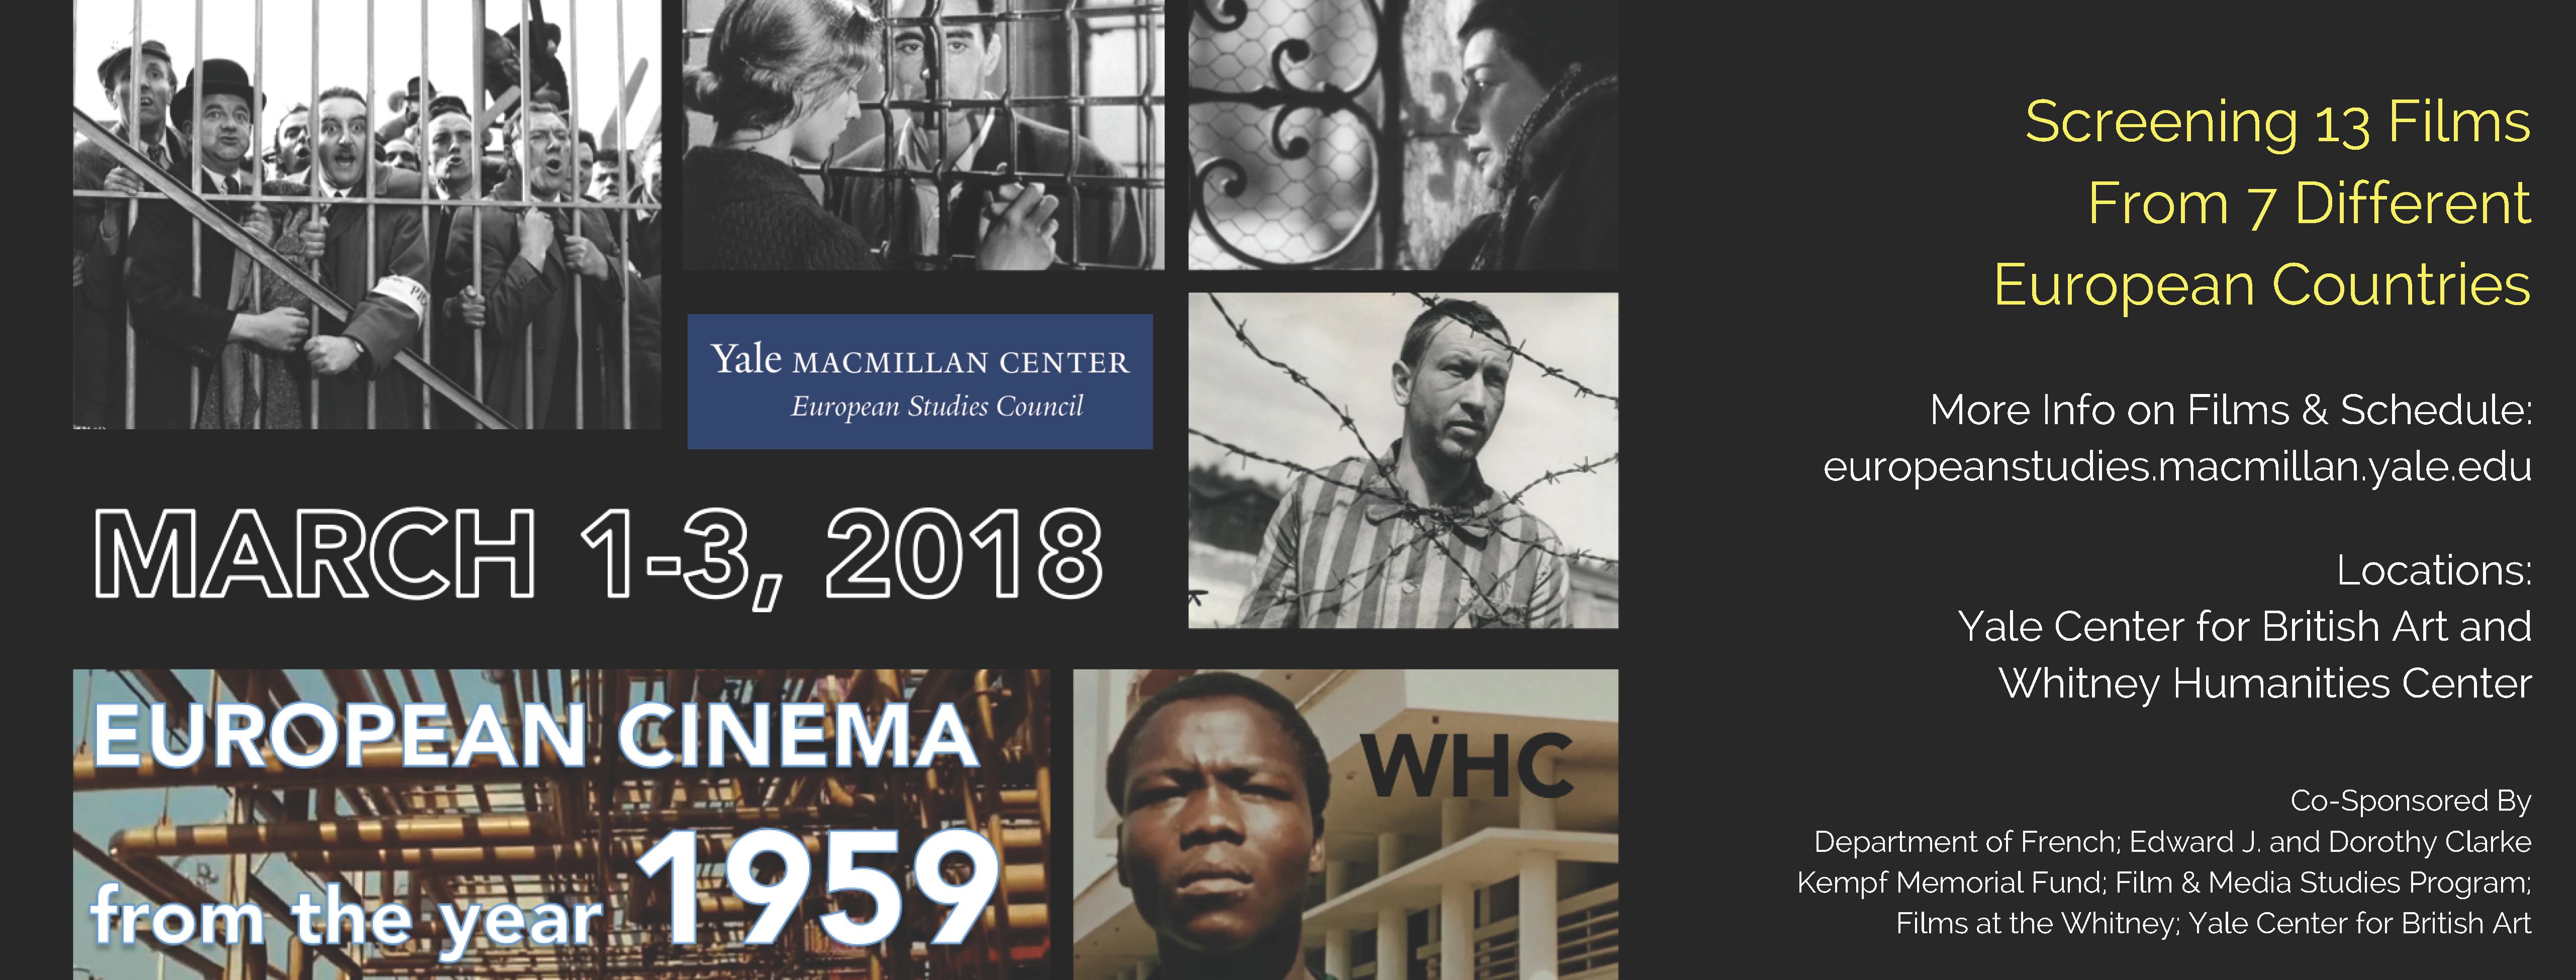 Information for European Cinema event